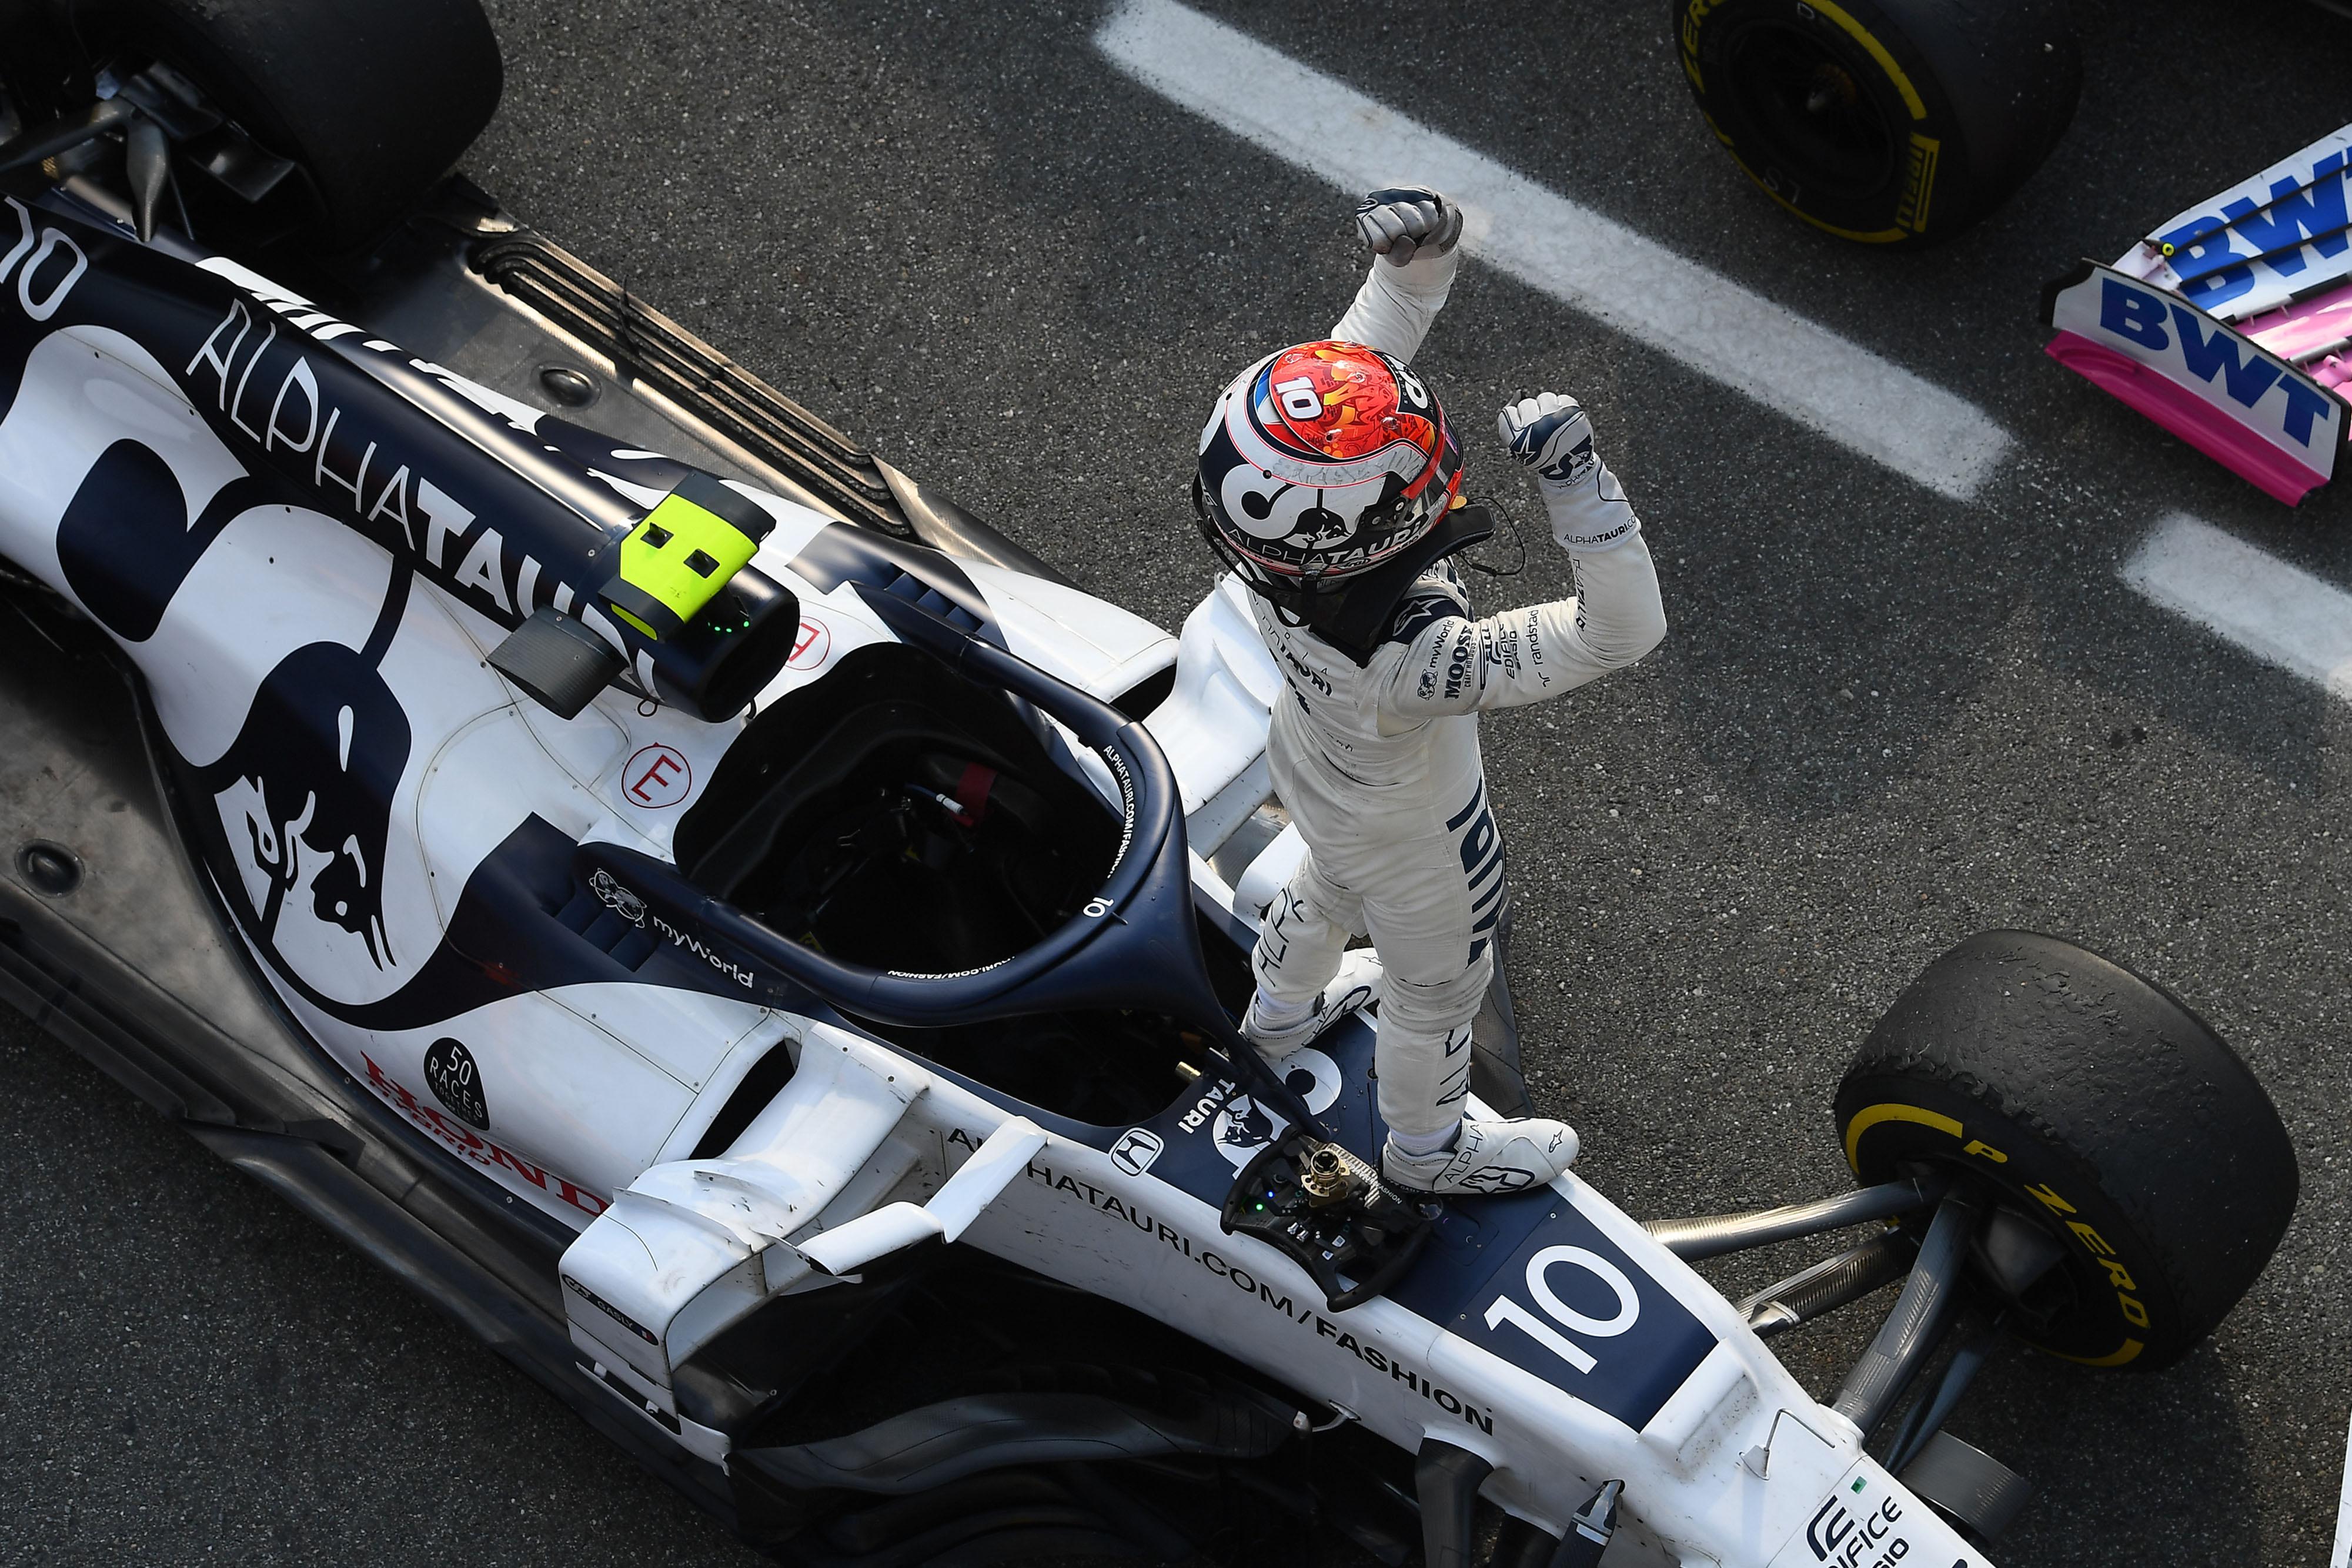 Pierre Gasly wins Italian Grand Prix 2020 Monza